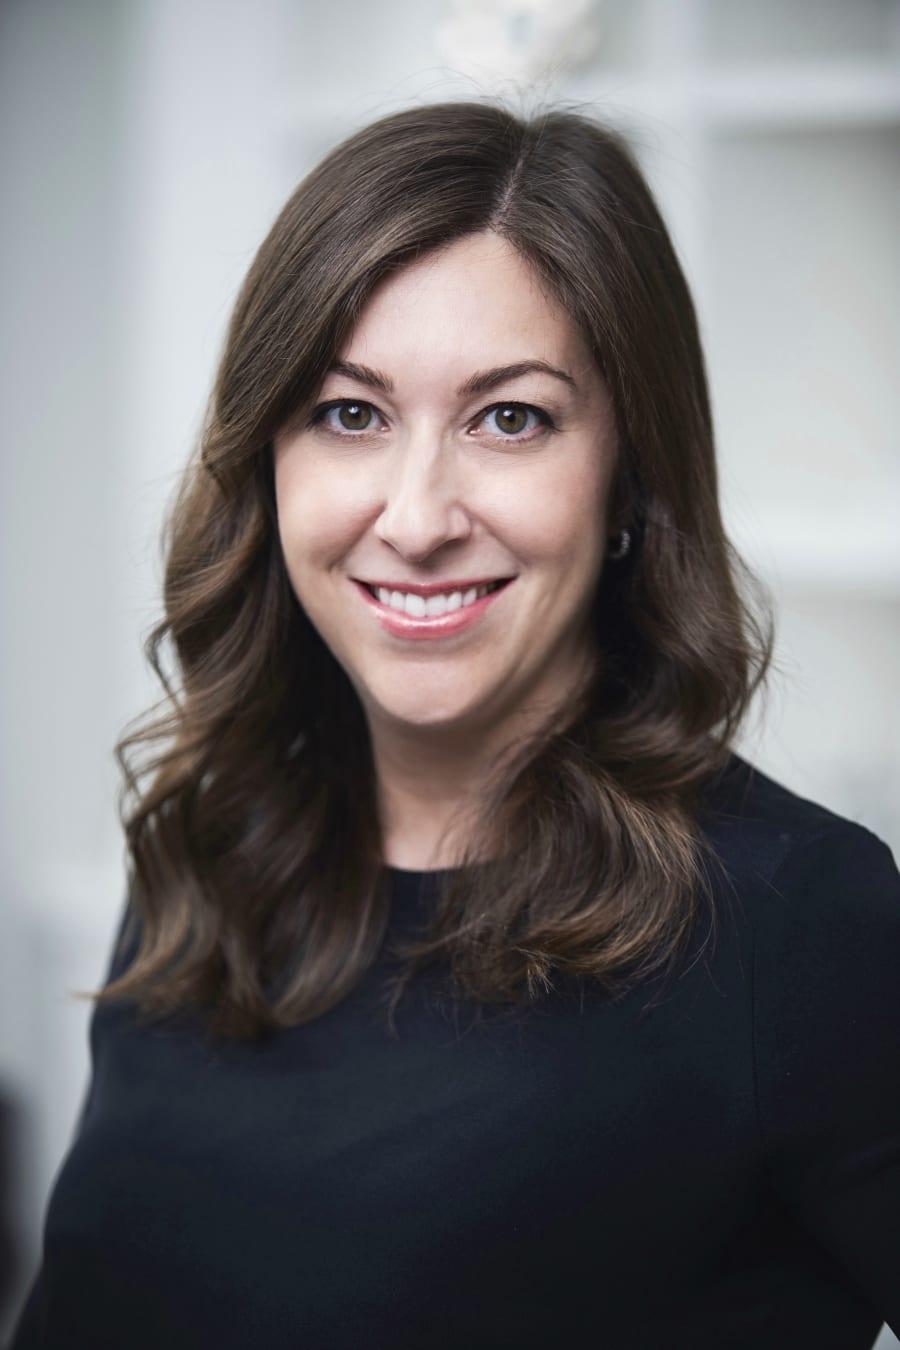 Sabrina Kaufman, Broker on Record